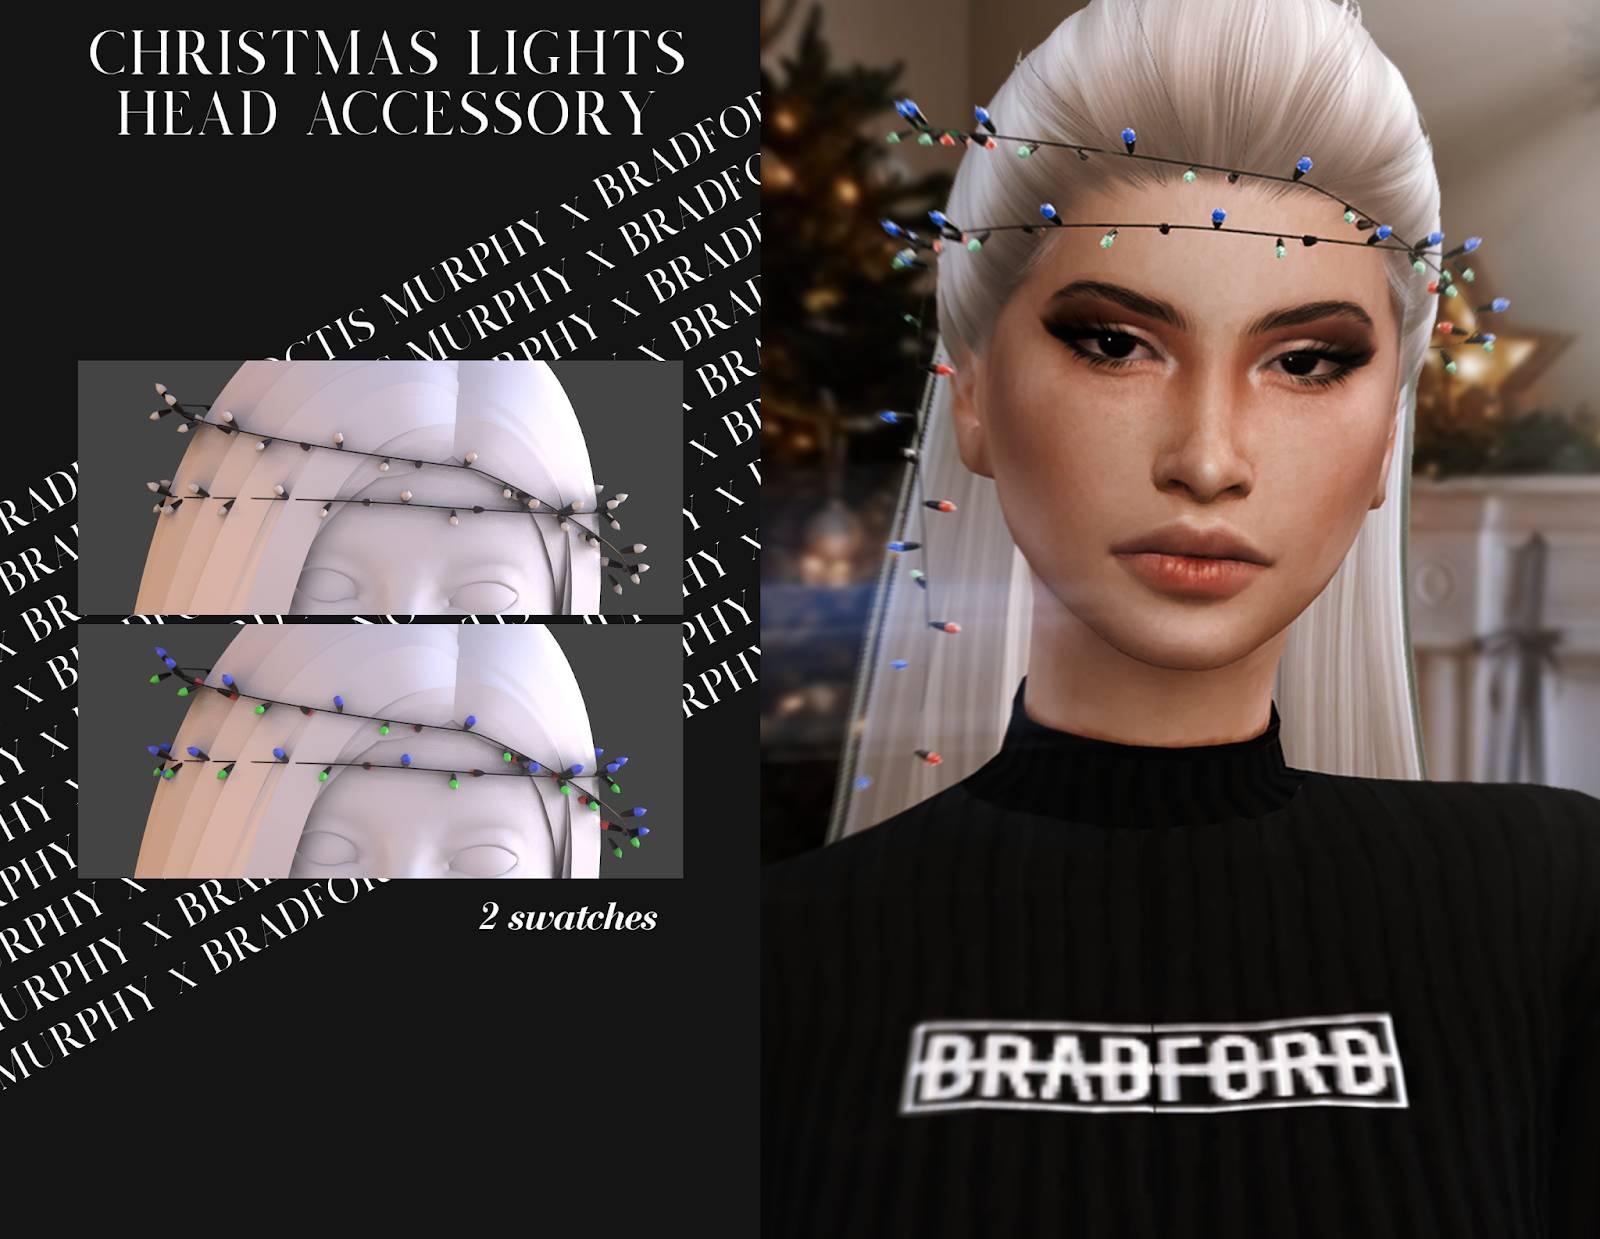 Гирлянда для головы - Christmas Lights Head Accessory